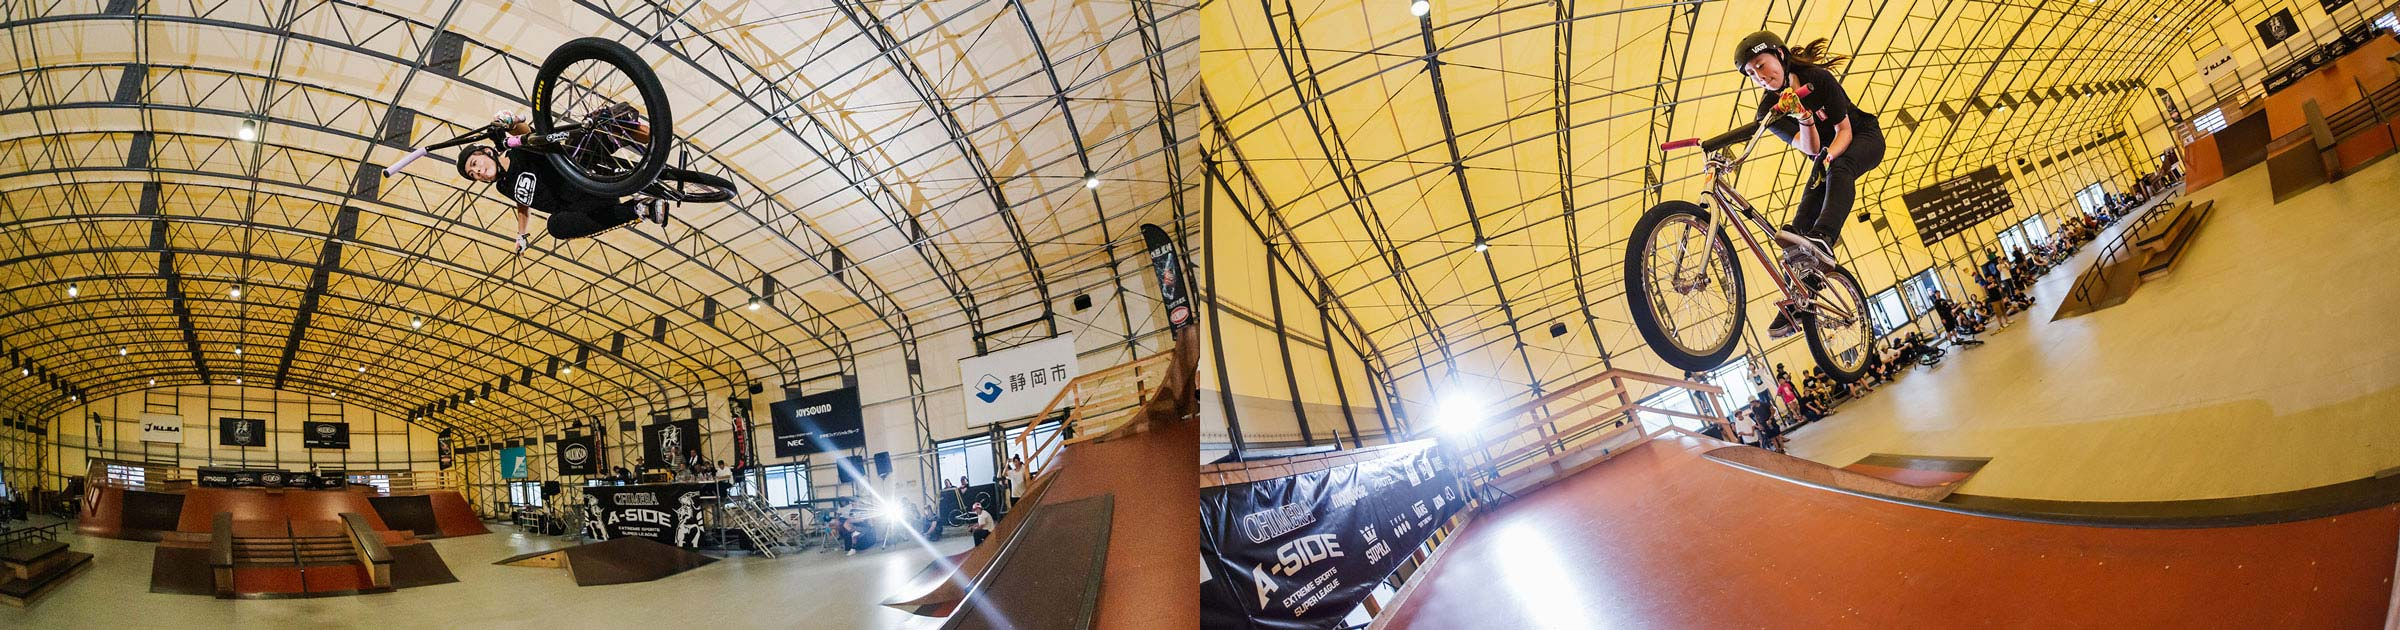 CHIMERA-A-SIDEの1stLEAGUE-2019のReport メイン画像:BMX-FreestylePark BMXフリースタイルパーク